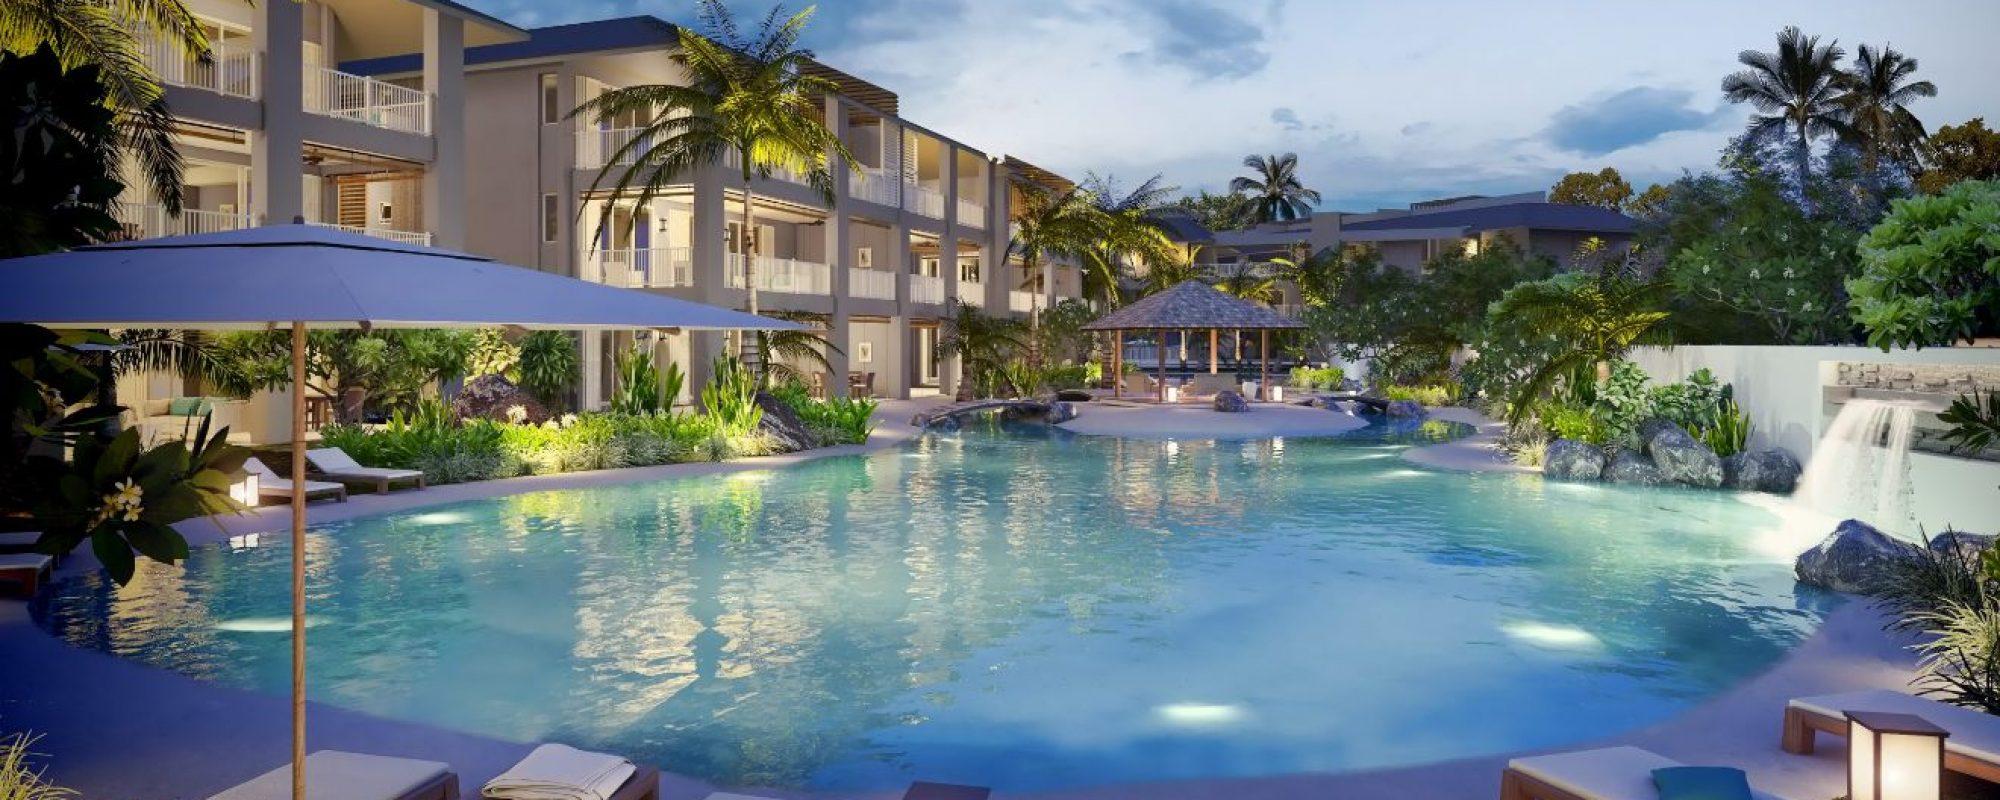 Ki Residences - Mauritius Luxury Homes